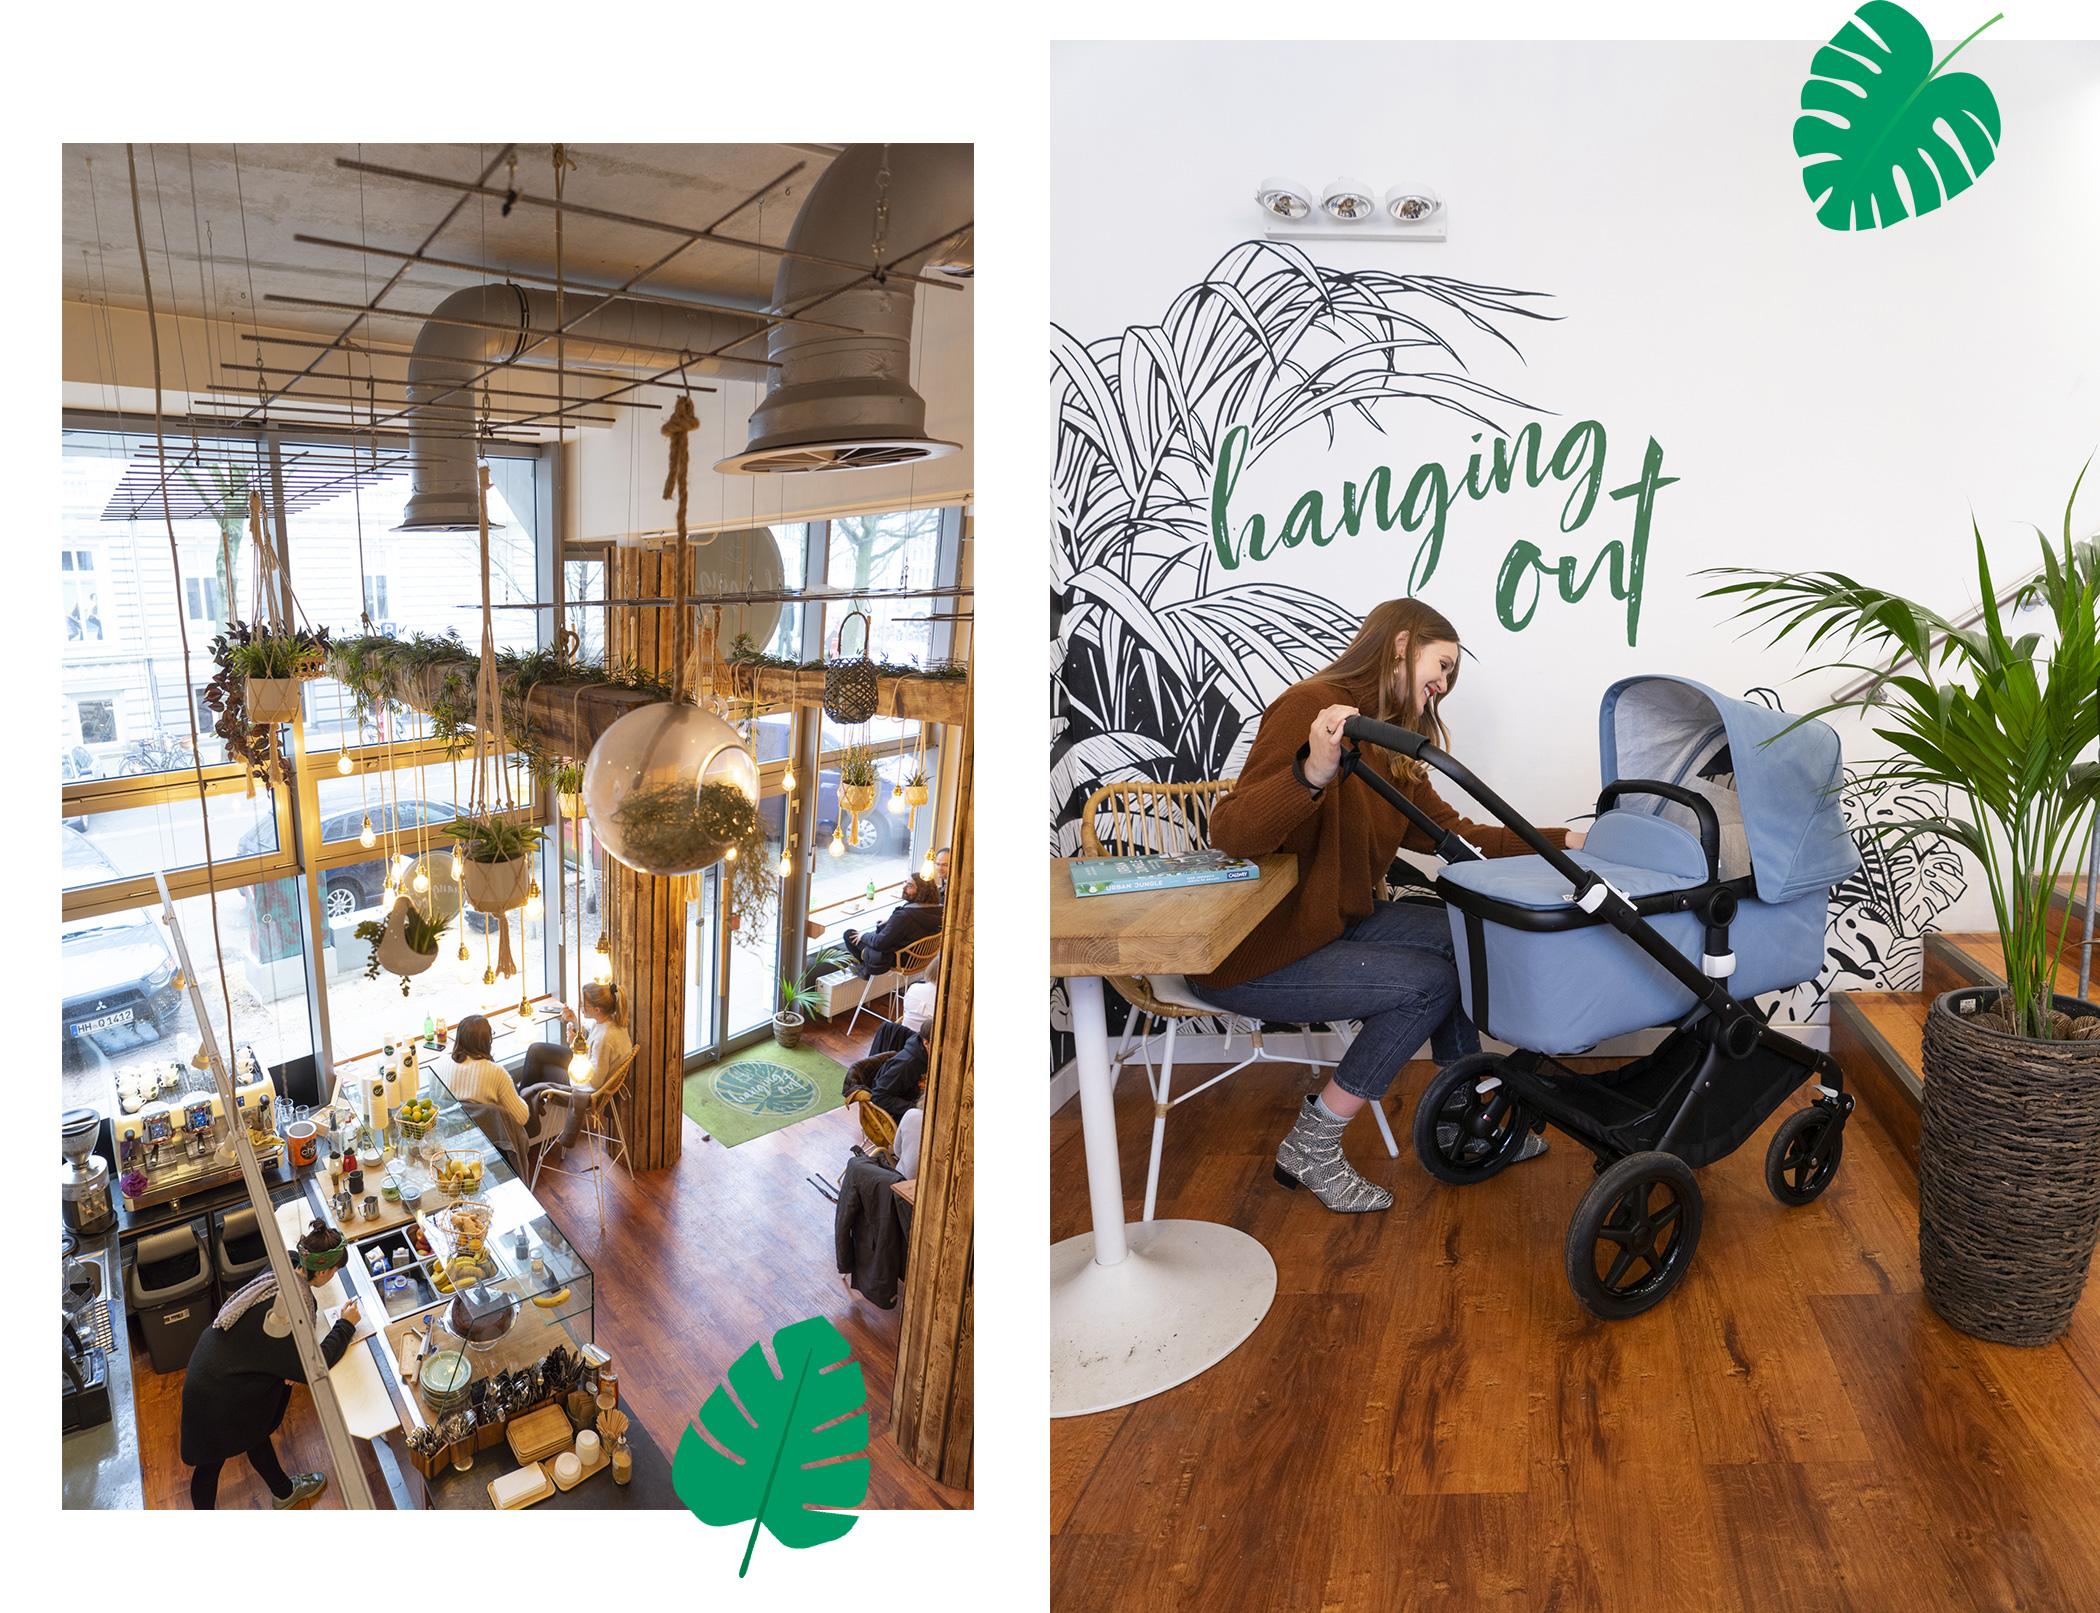 femtastics-Urban-Slow-Spots-Hanging-Out-Cafe-Hamburg